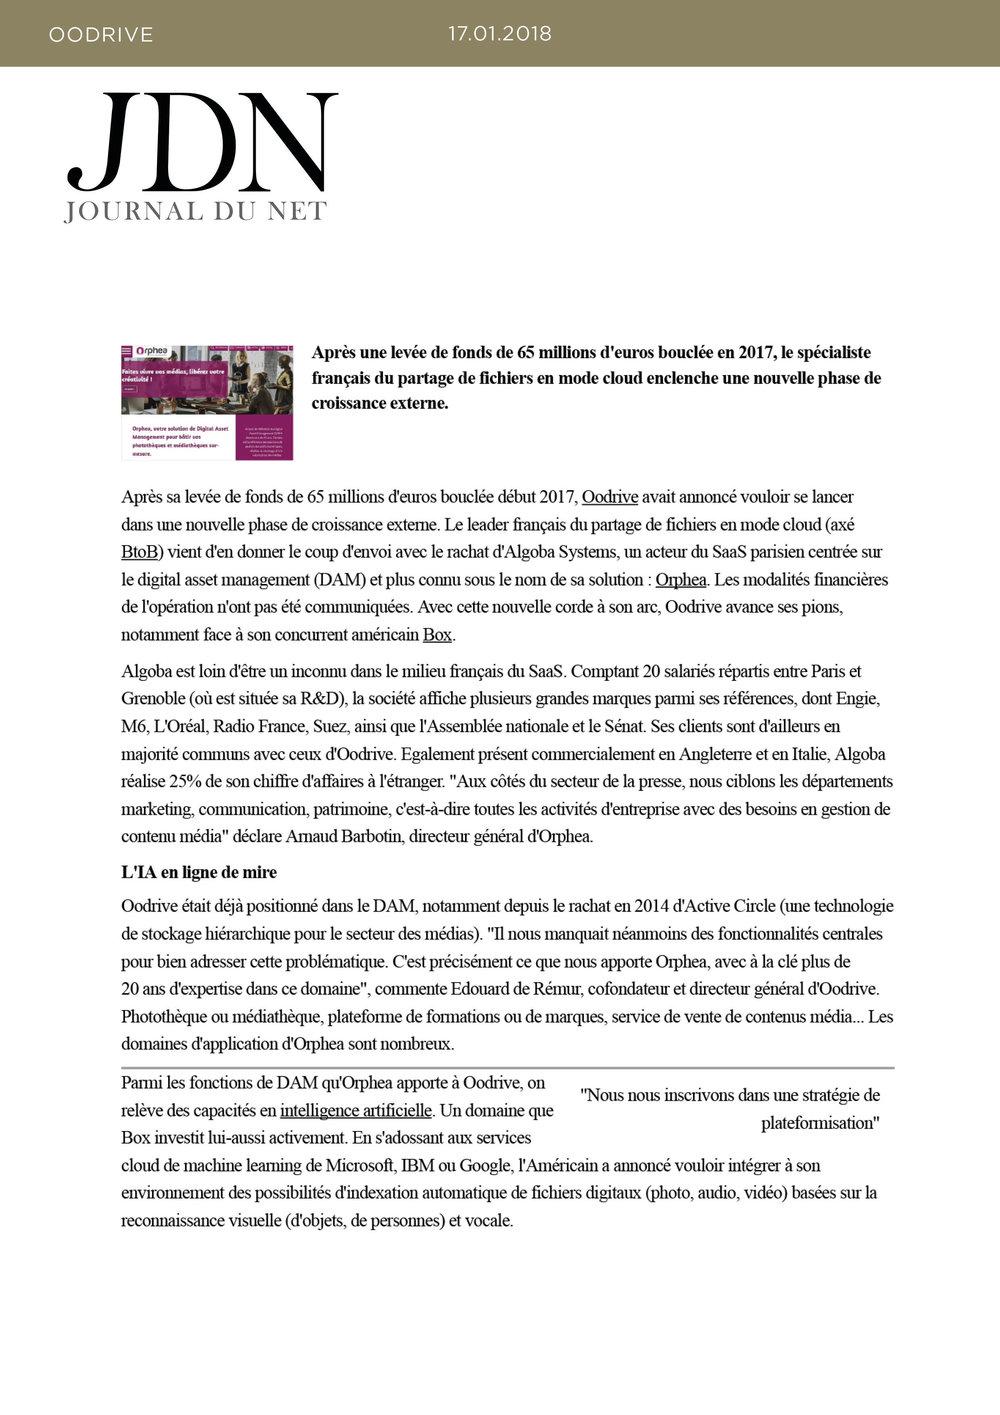 BOOKMEDIA_JANV_WEB30.jpg